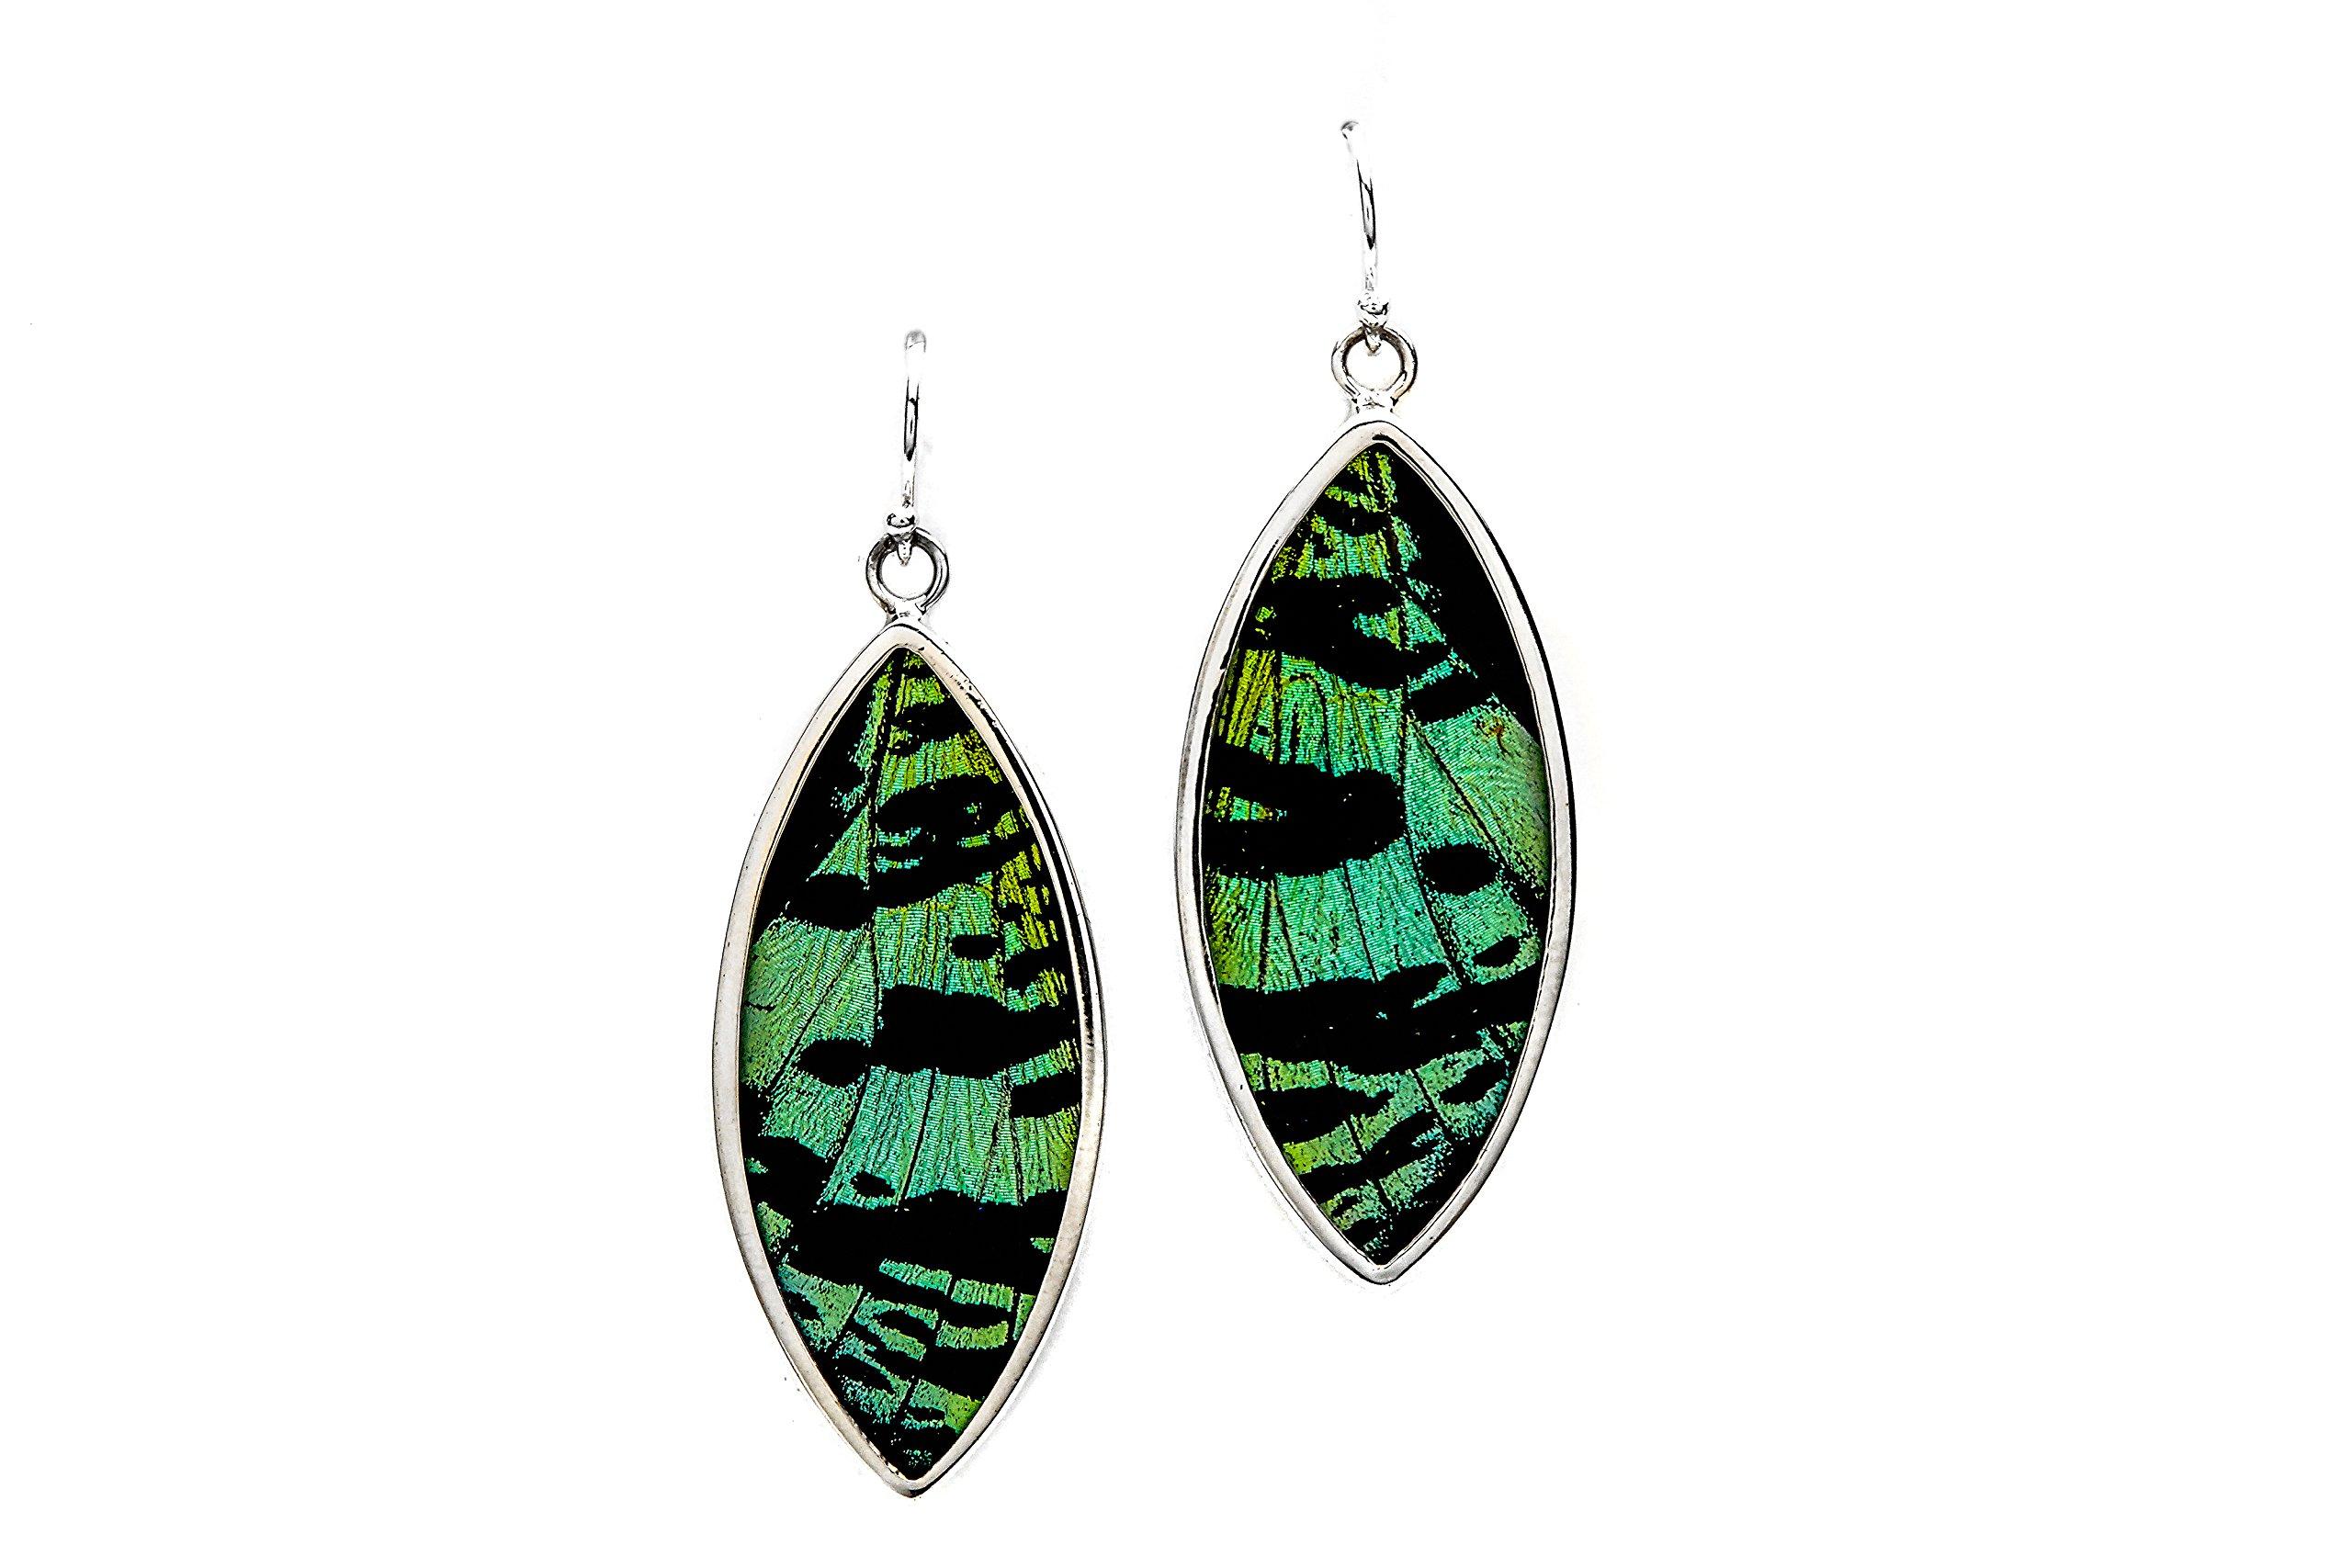 Real Butterfly Wing Earrings in Sterling Silver - Style #8